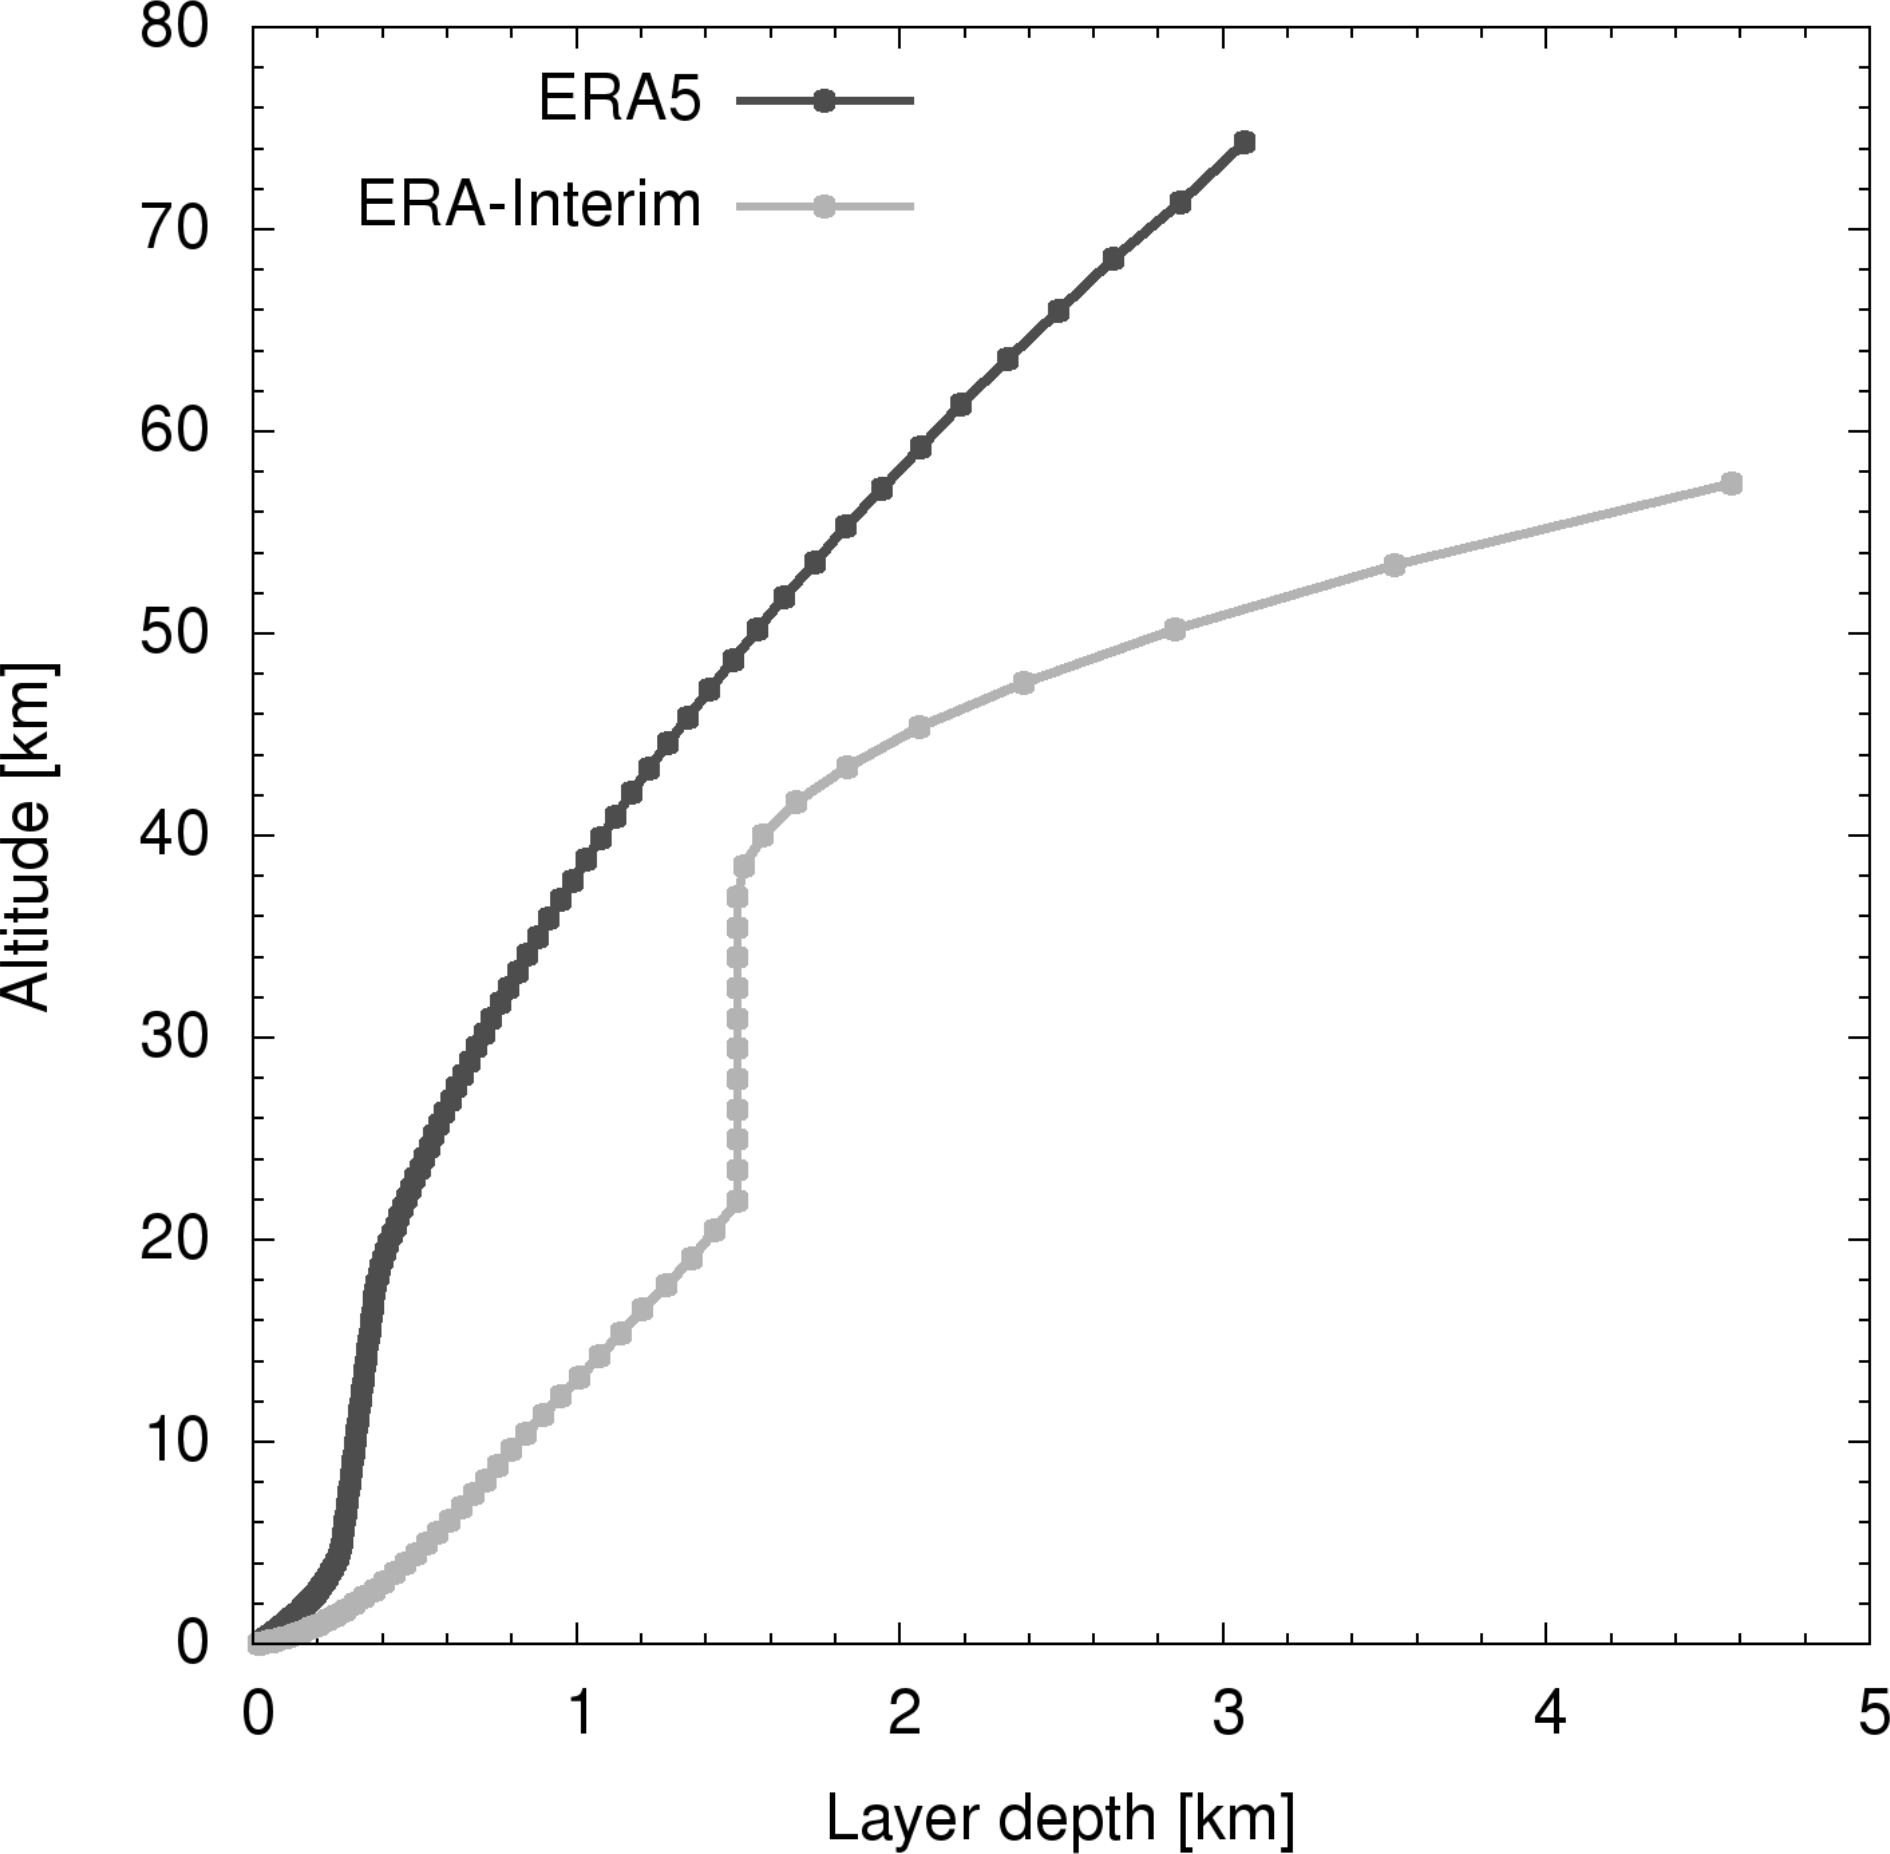 ACP - From ERA-Interim to ERA5: the considerable impact of